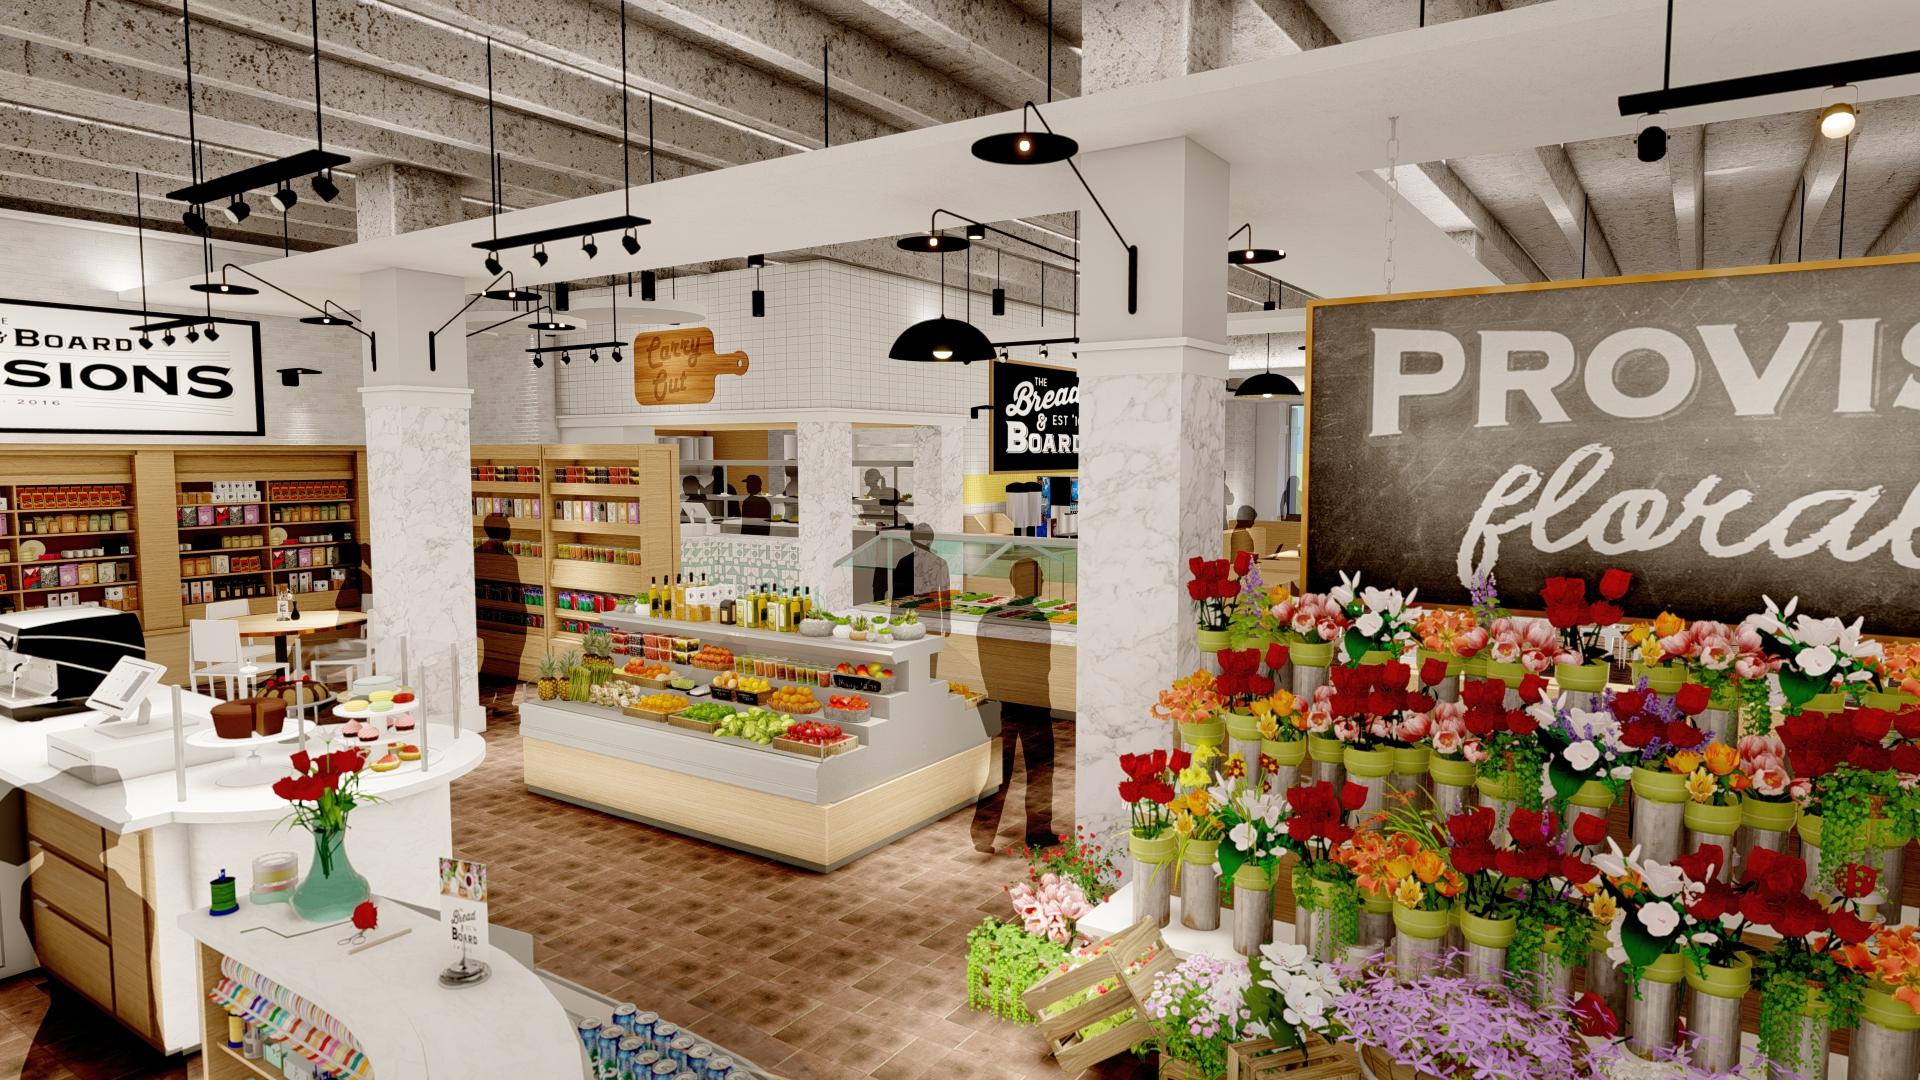 Bread & Board Provisions rendering, Jacksonville, FL